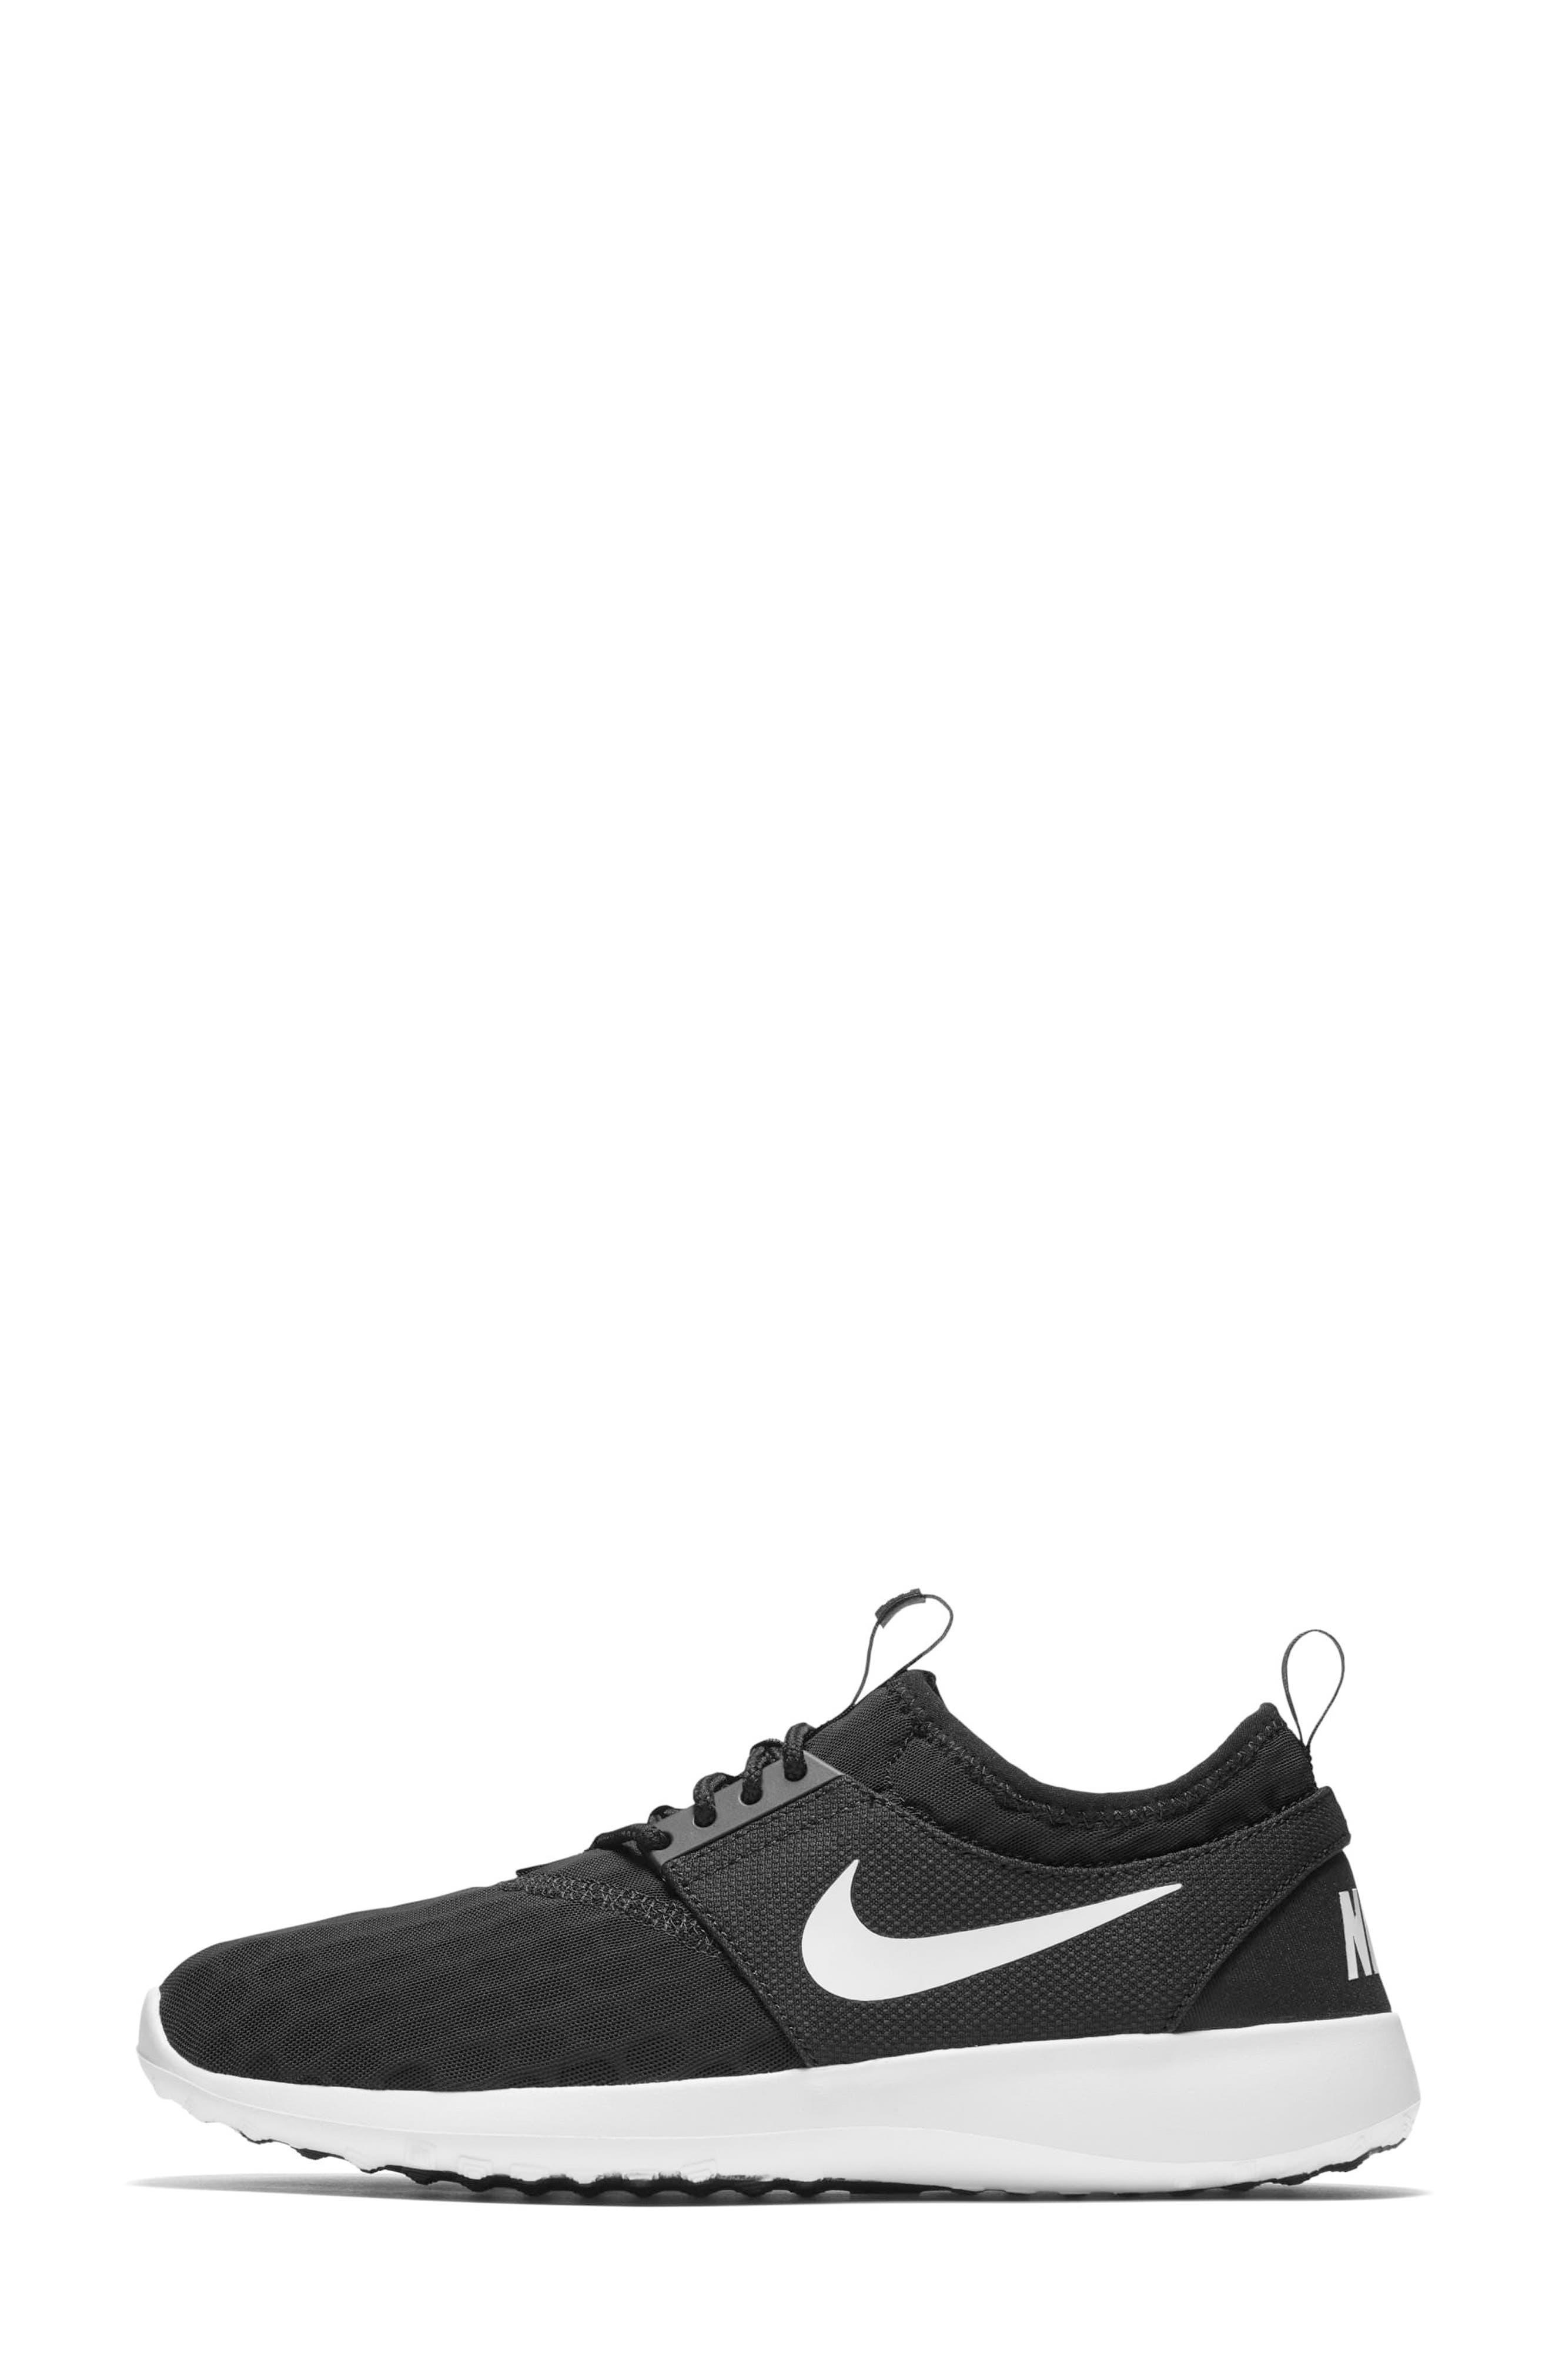 Juvenate Sneaker,                             Alternate thumbnail 125, color,